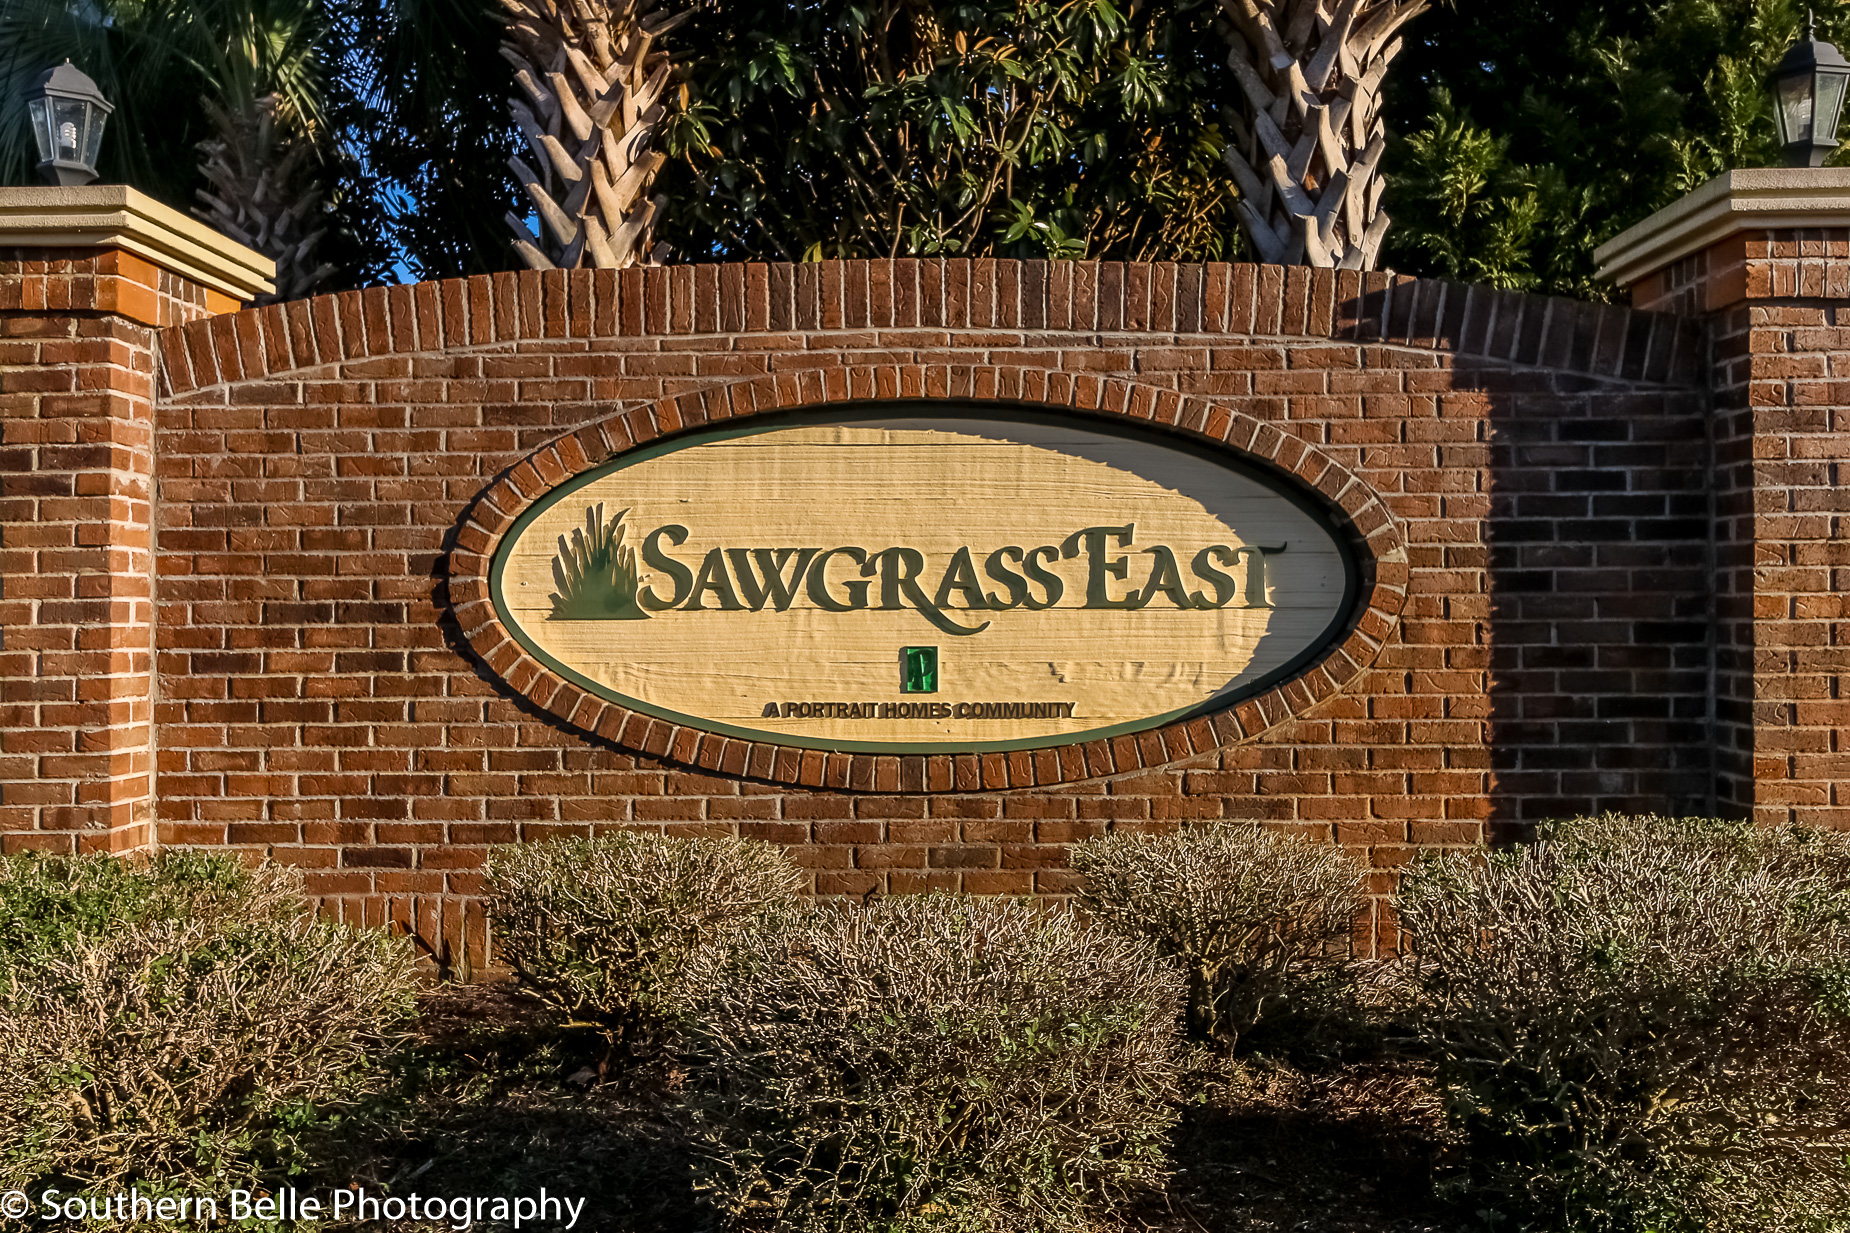 1.Sawgreass East WM